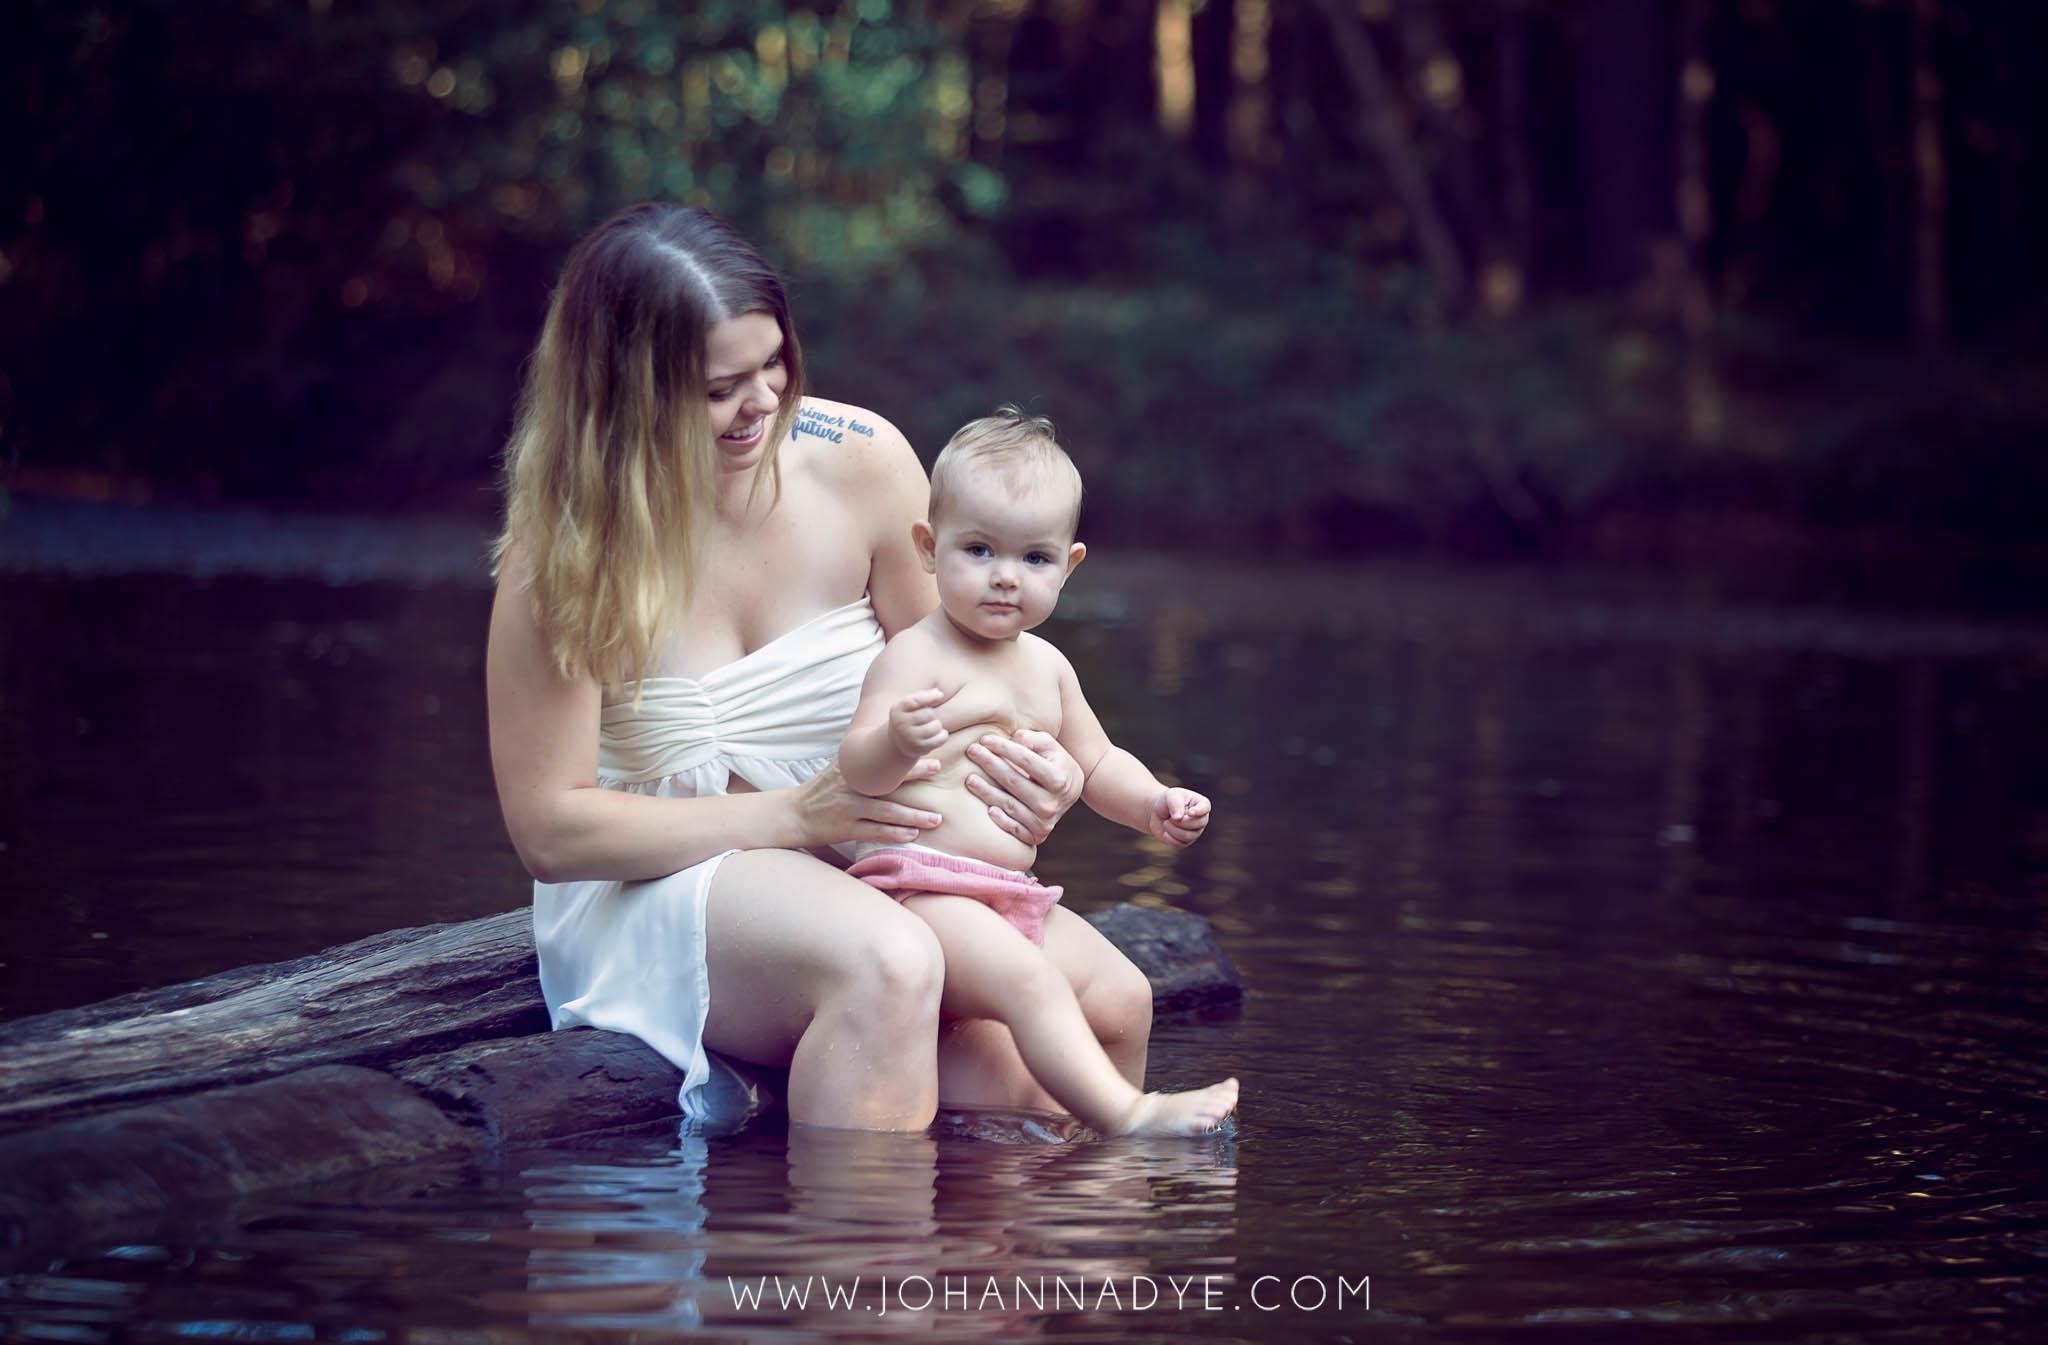 Breastfeeding Photography Session in Fayetteville North Carolina - Johanna Dye